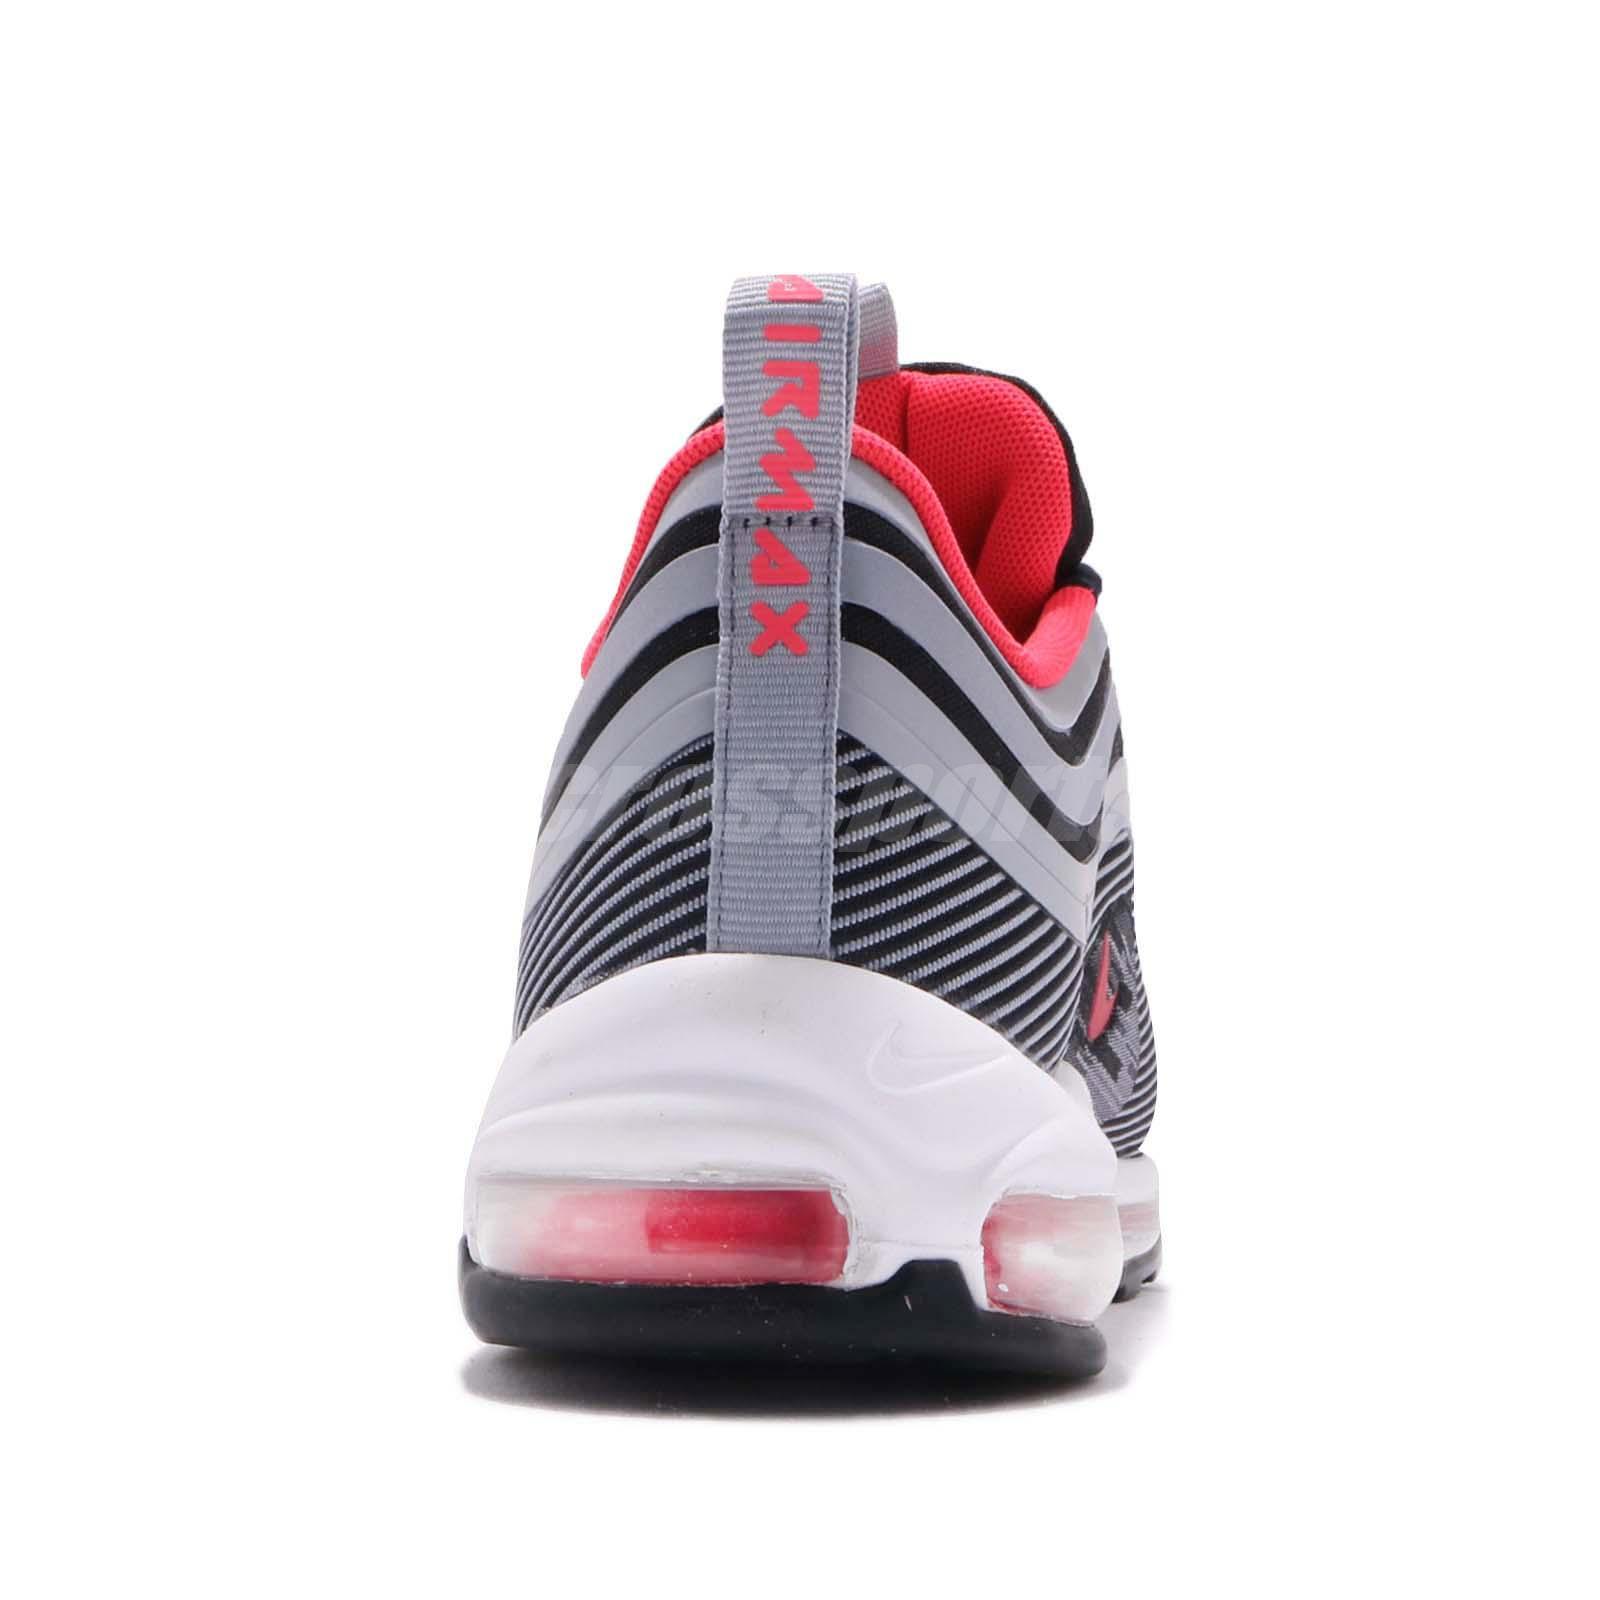 a1850c0f75 Nike Air Max 97 UL 17 Red Orbit Black Grey Men Running Shoes ...